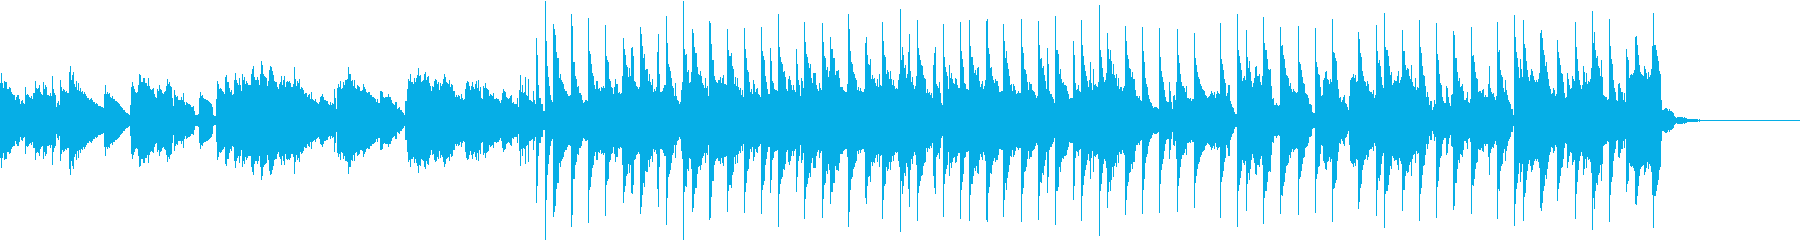 DayGlow  的な80年代ポップスの再生済みの波形